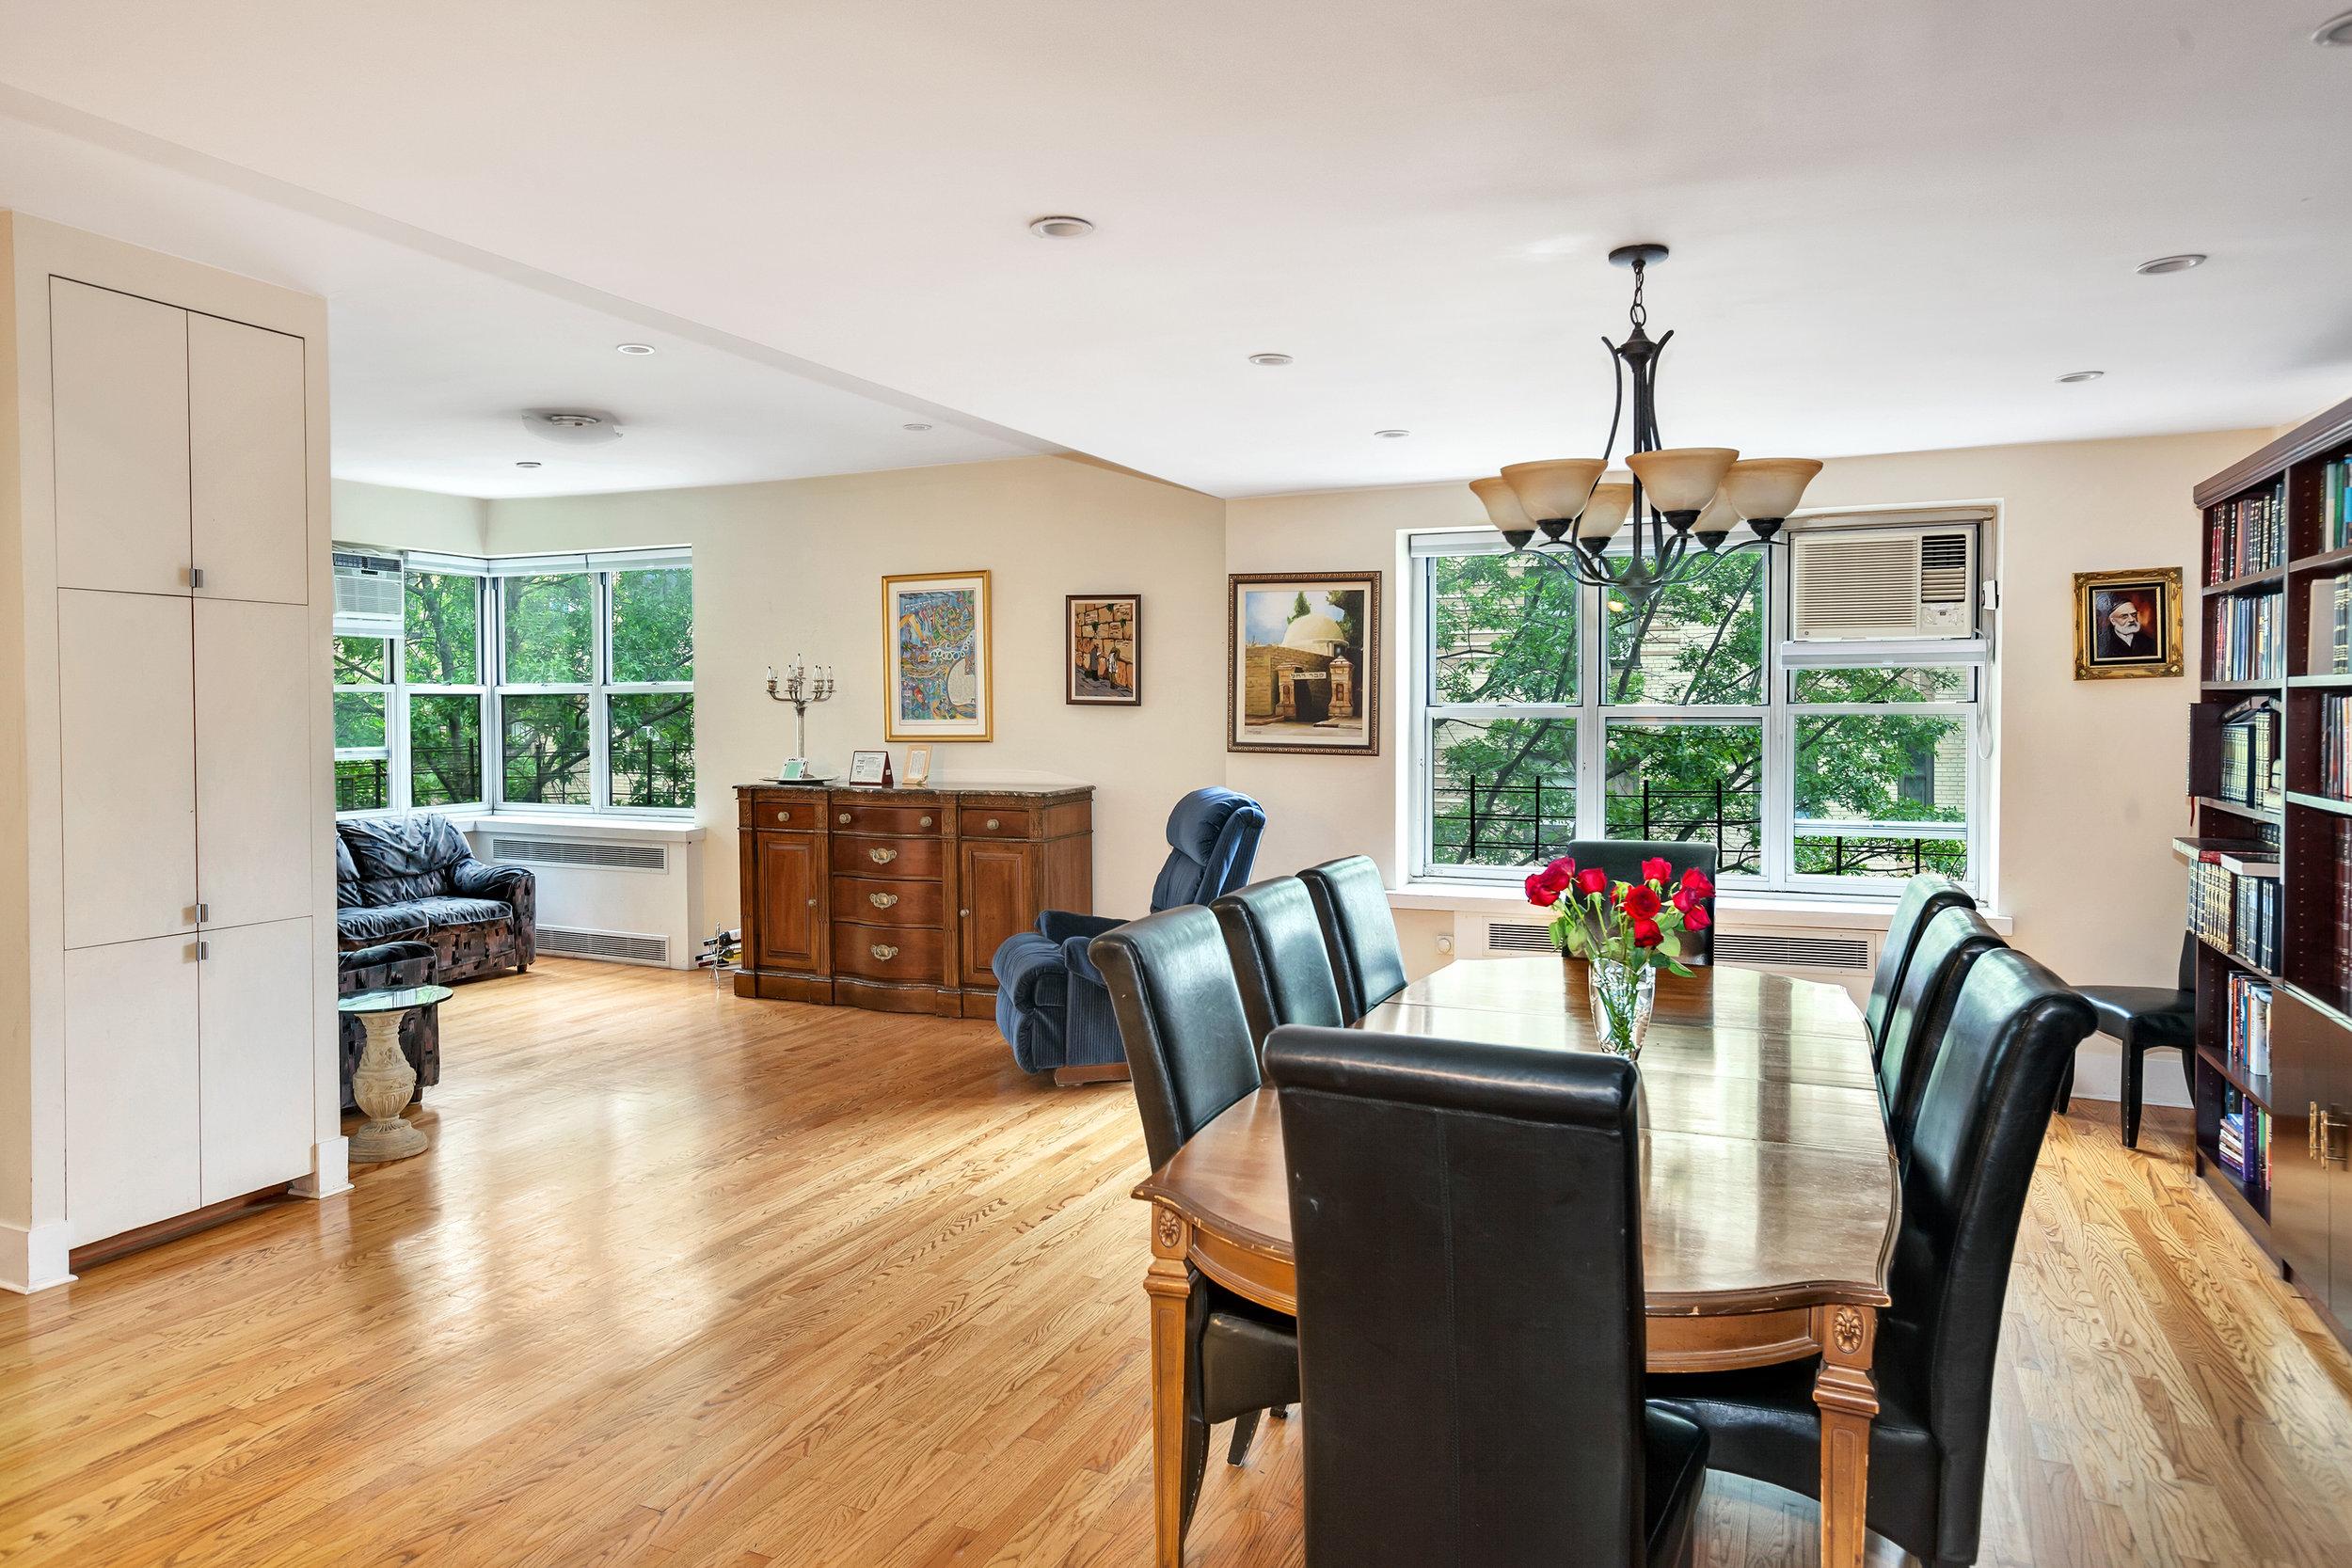 100 Bennett Avenue, #3D4CD - $1,350,000